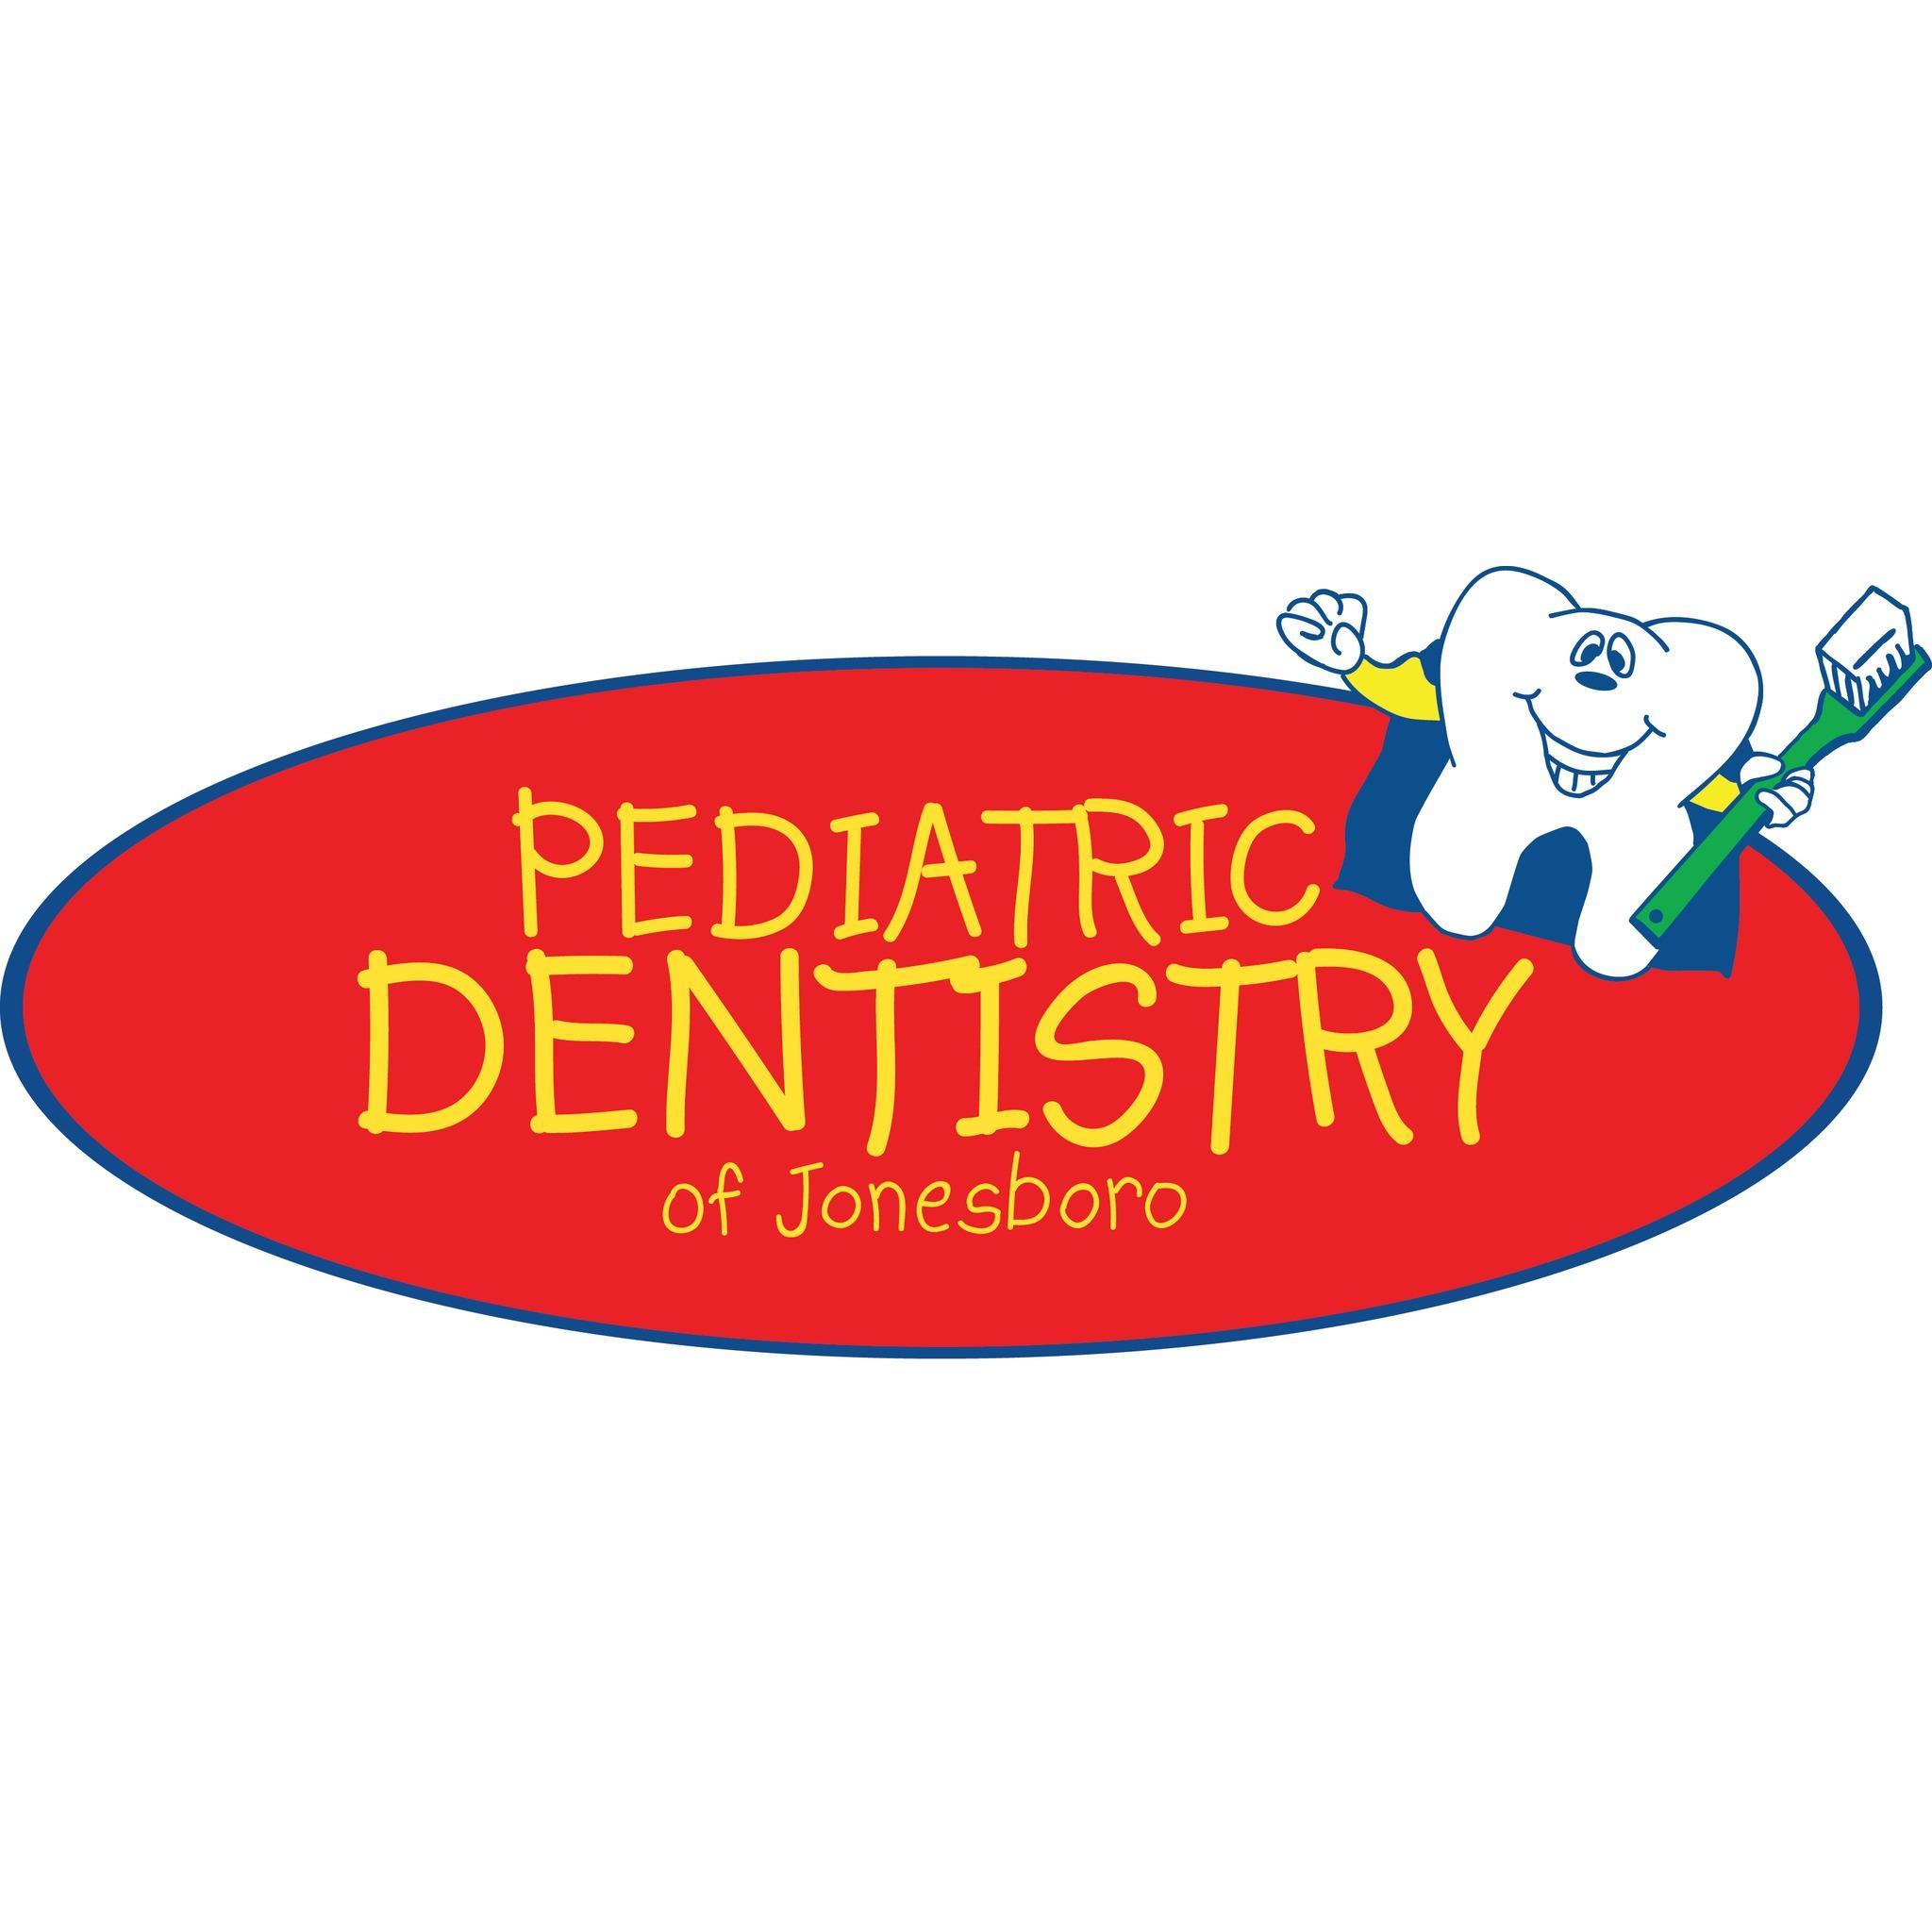 Pediatric Dentistry of Jonesboro